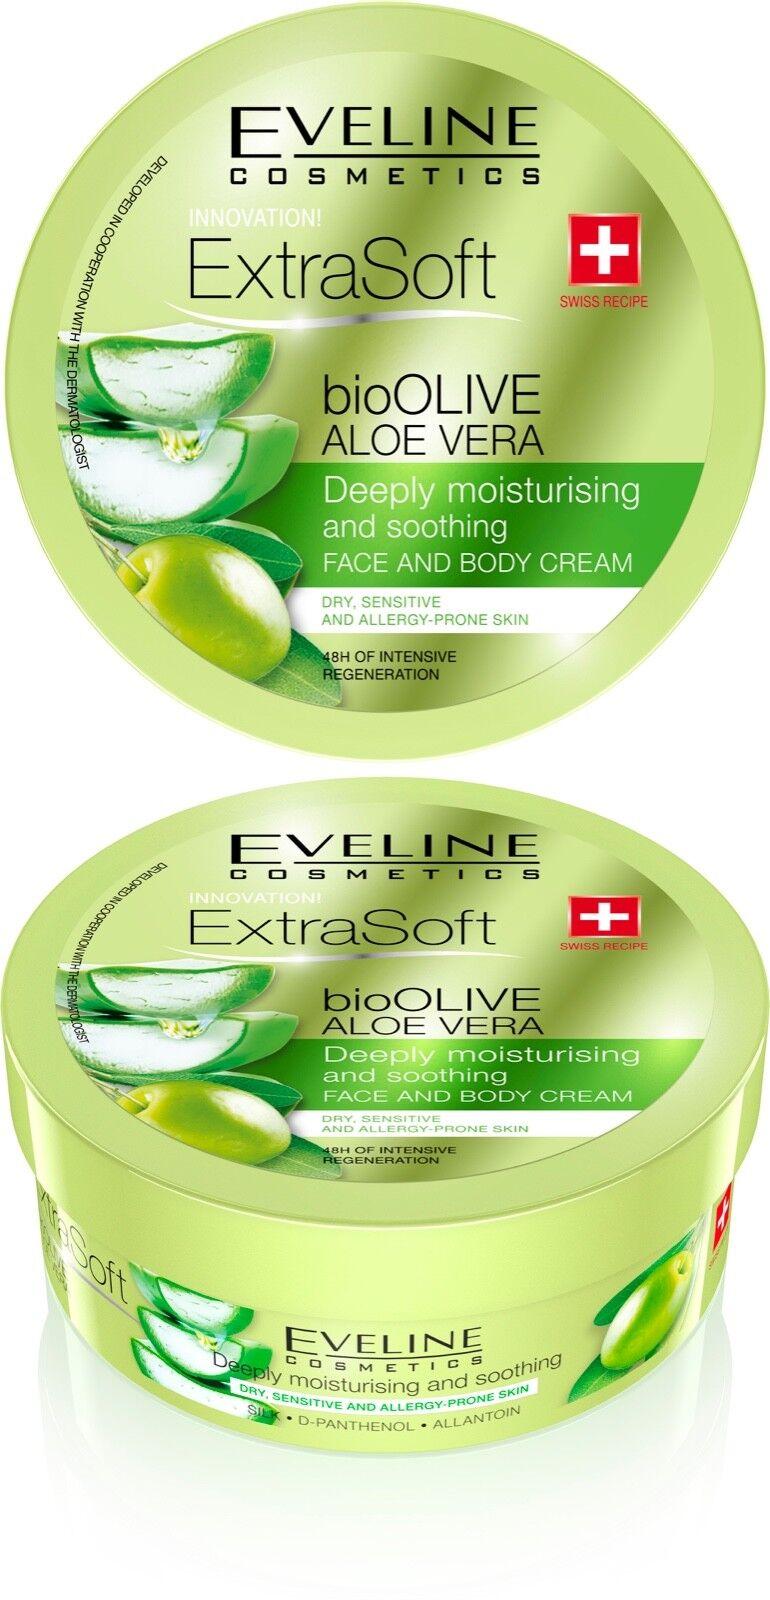 Eveline Cosmetics Extra Soft bio Olive Aloe Vera Deeply Moisturizing body cream Bath & Body